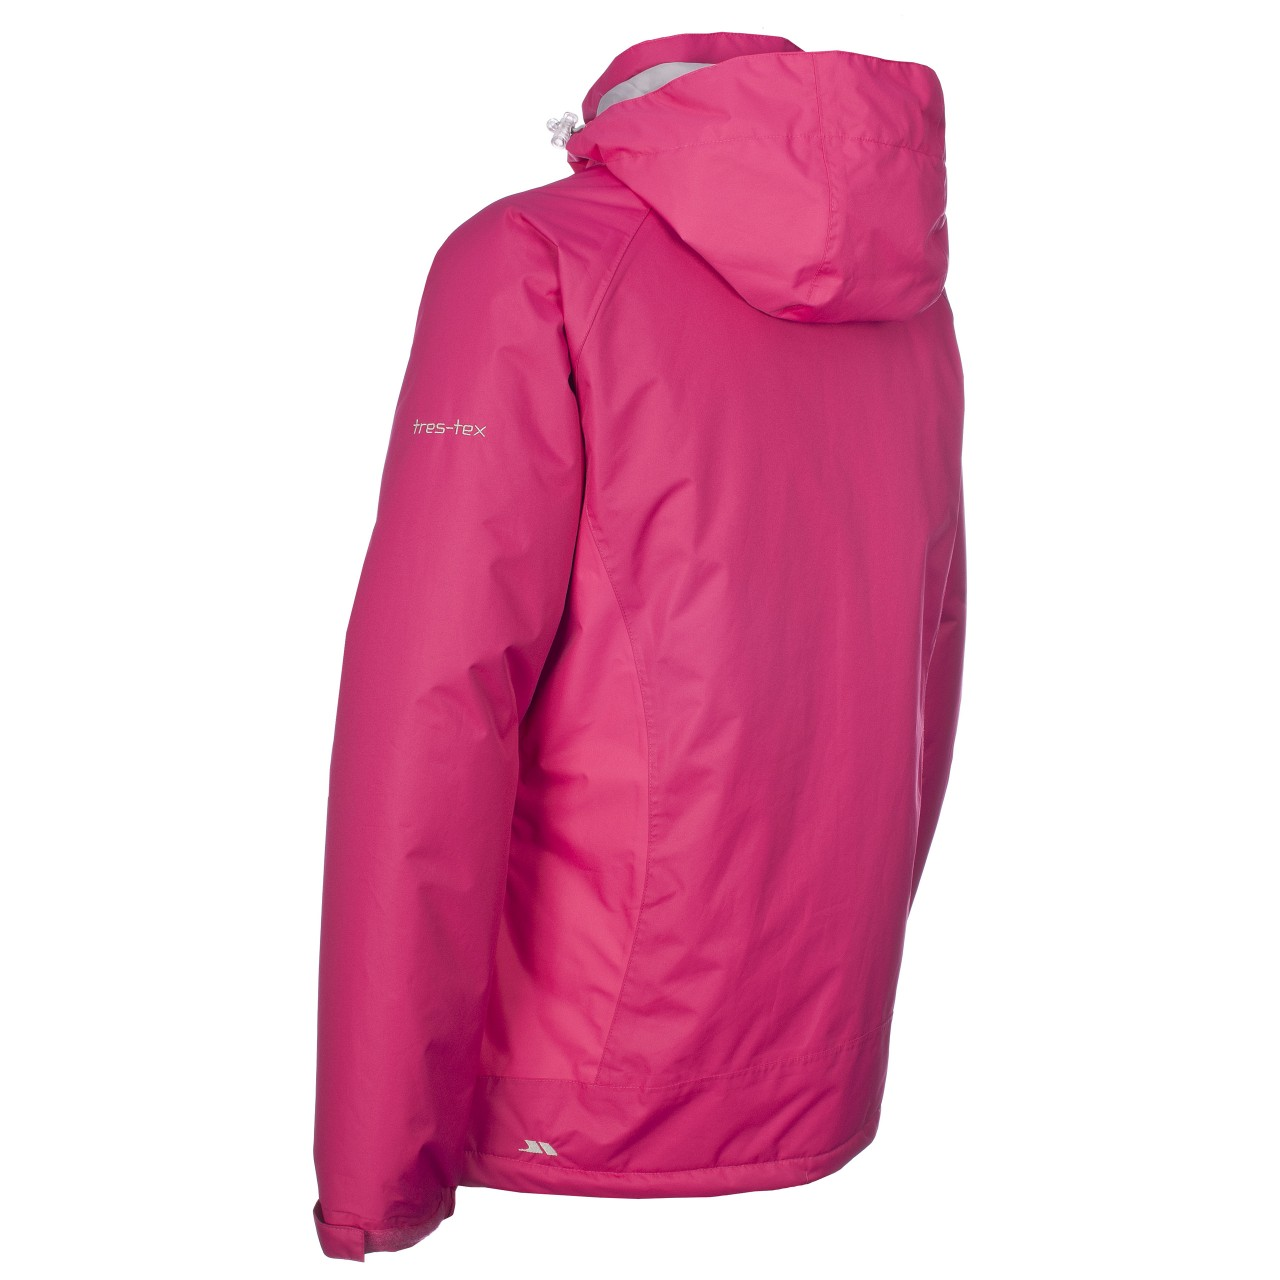 Kona Waterproof Jacket Review